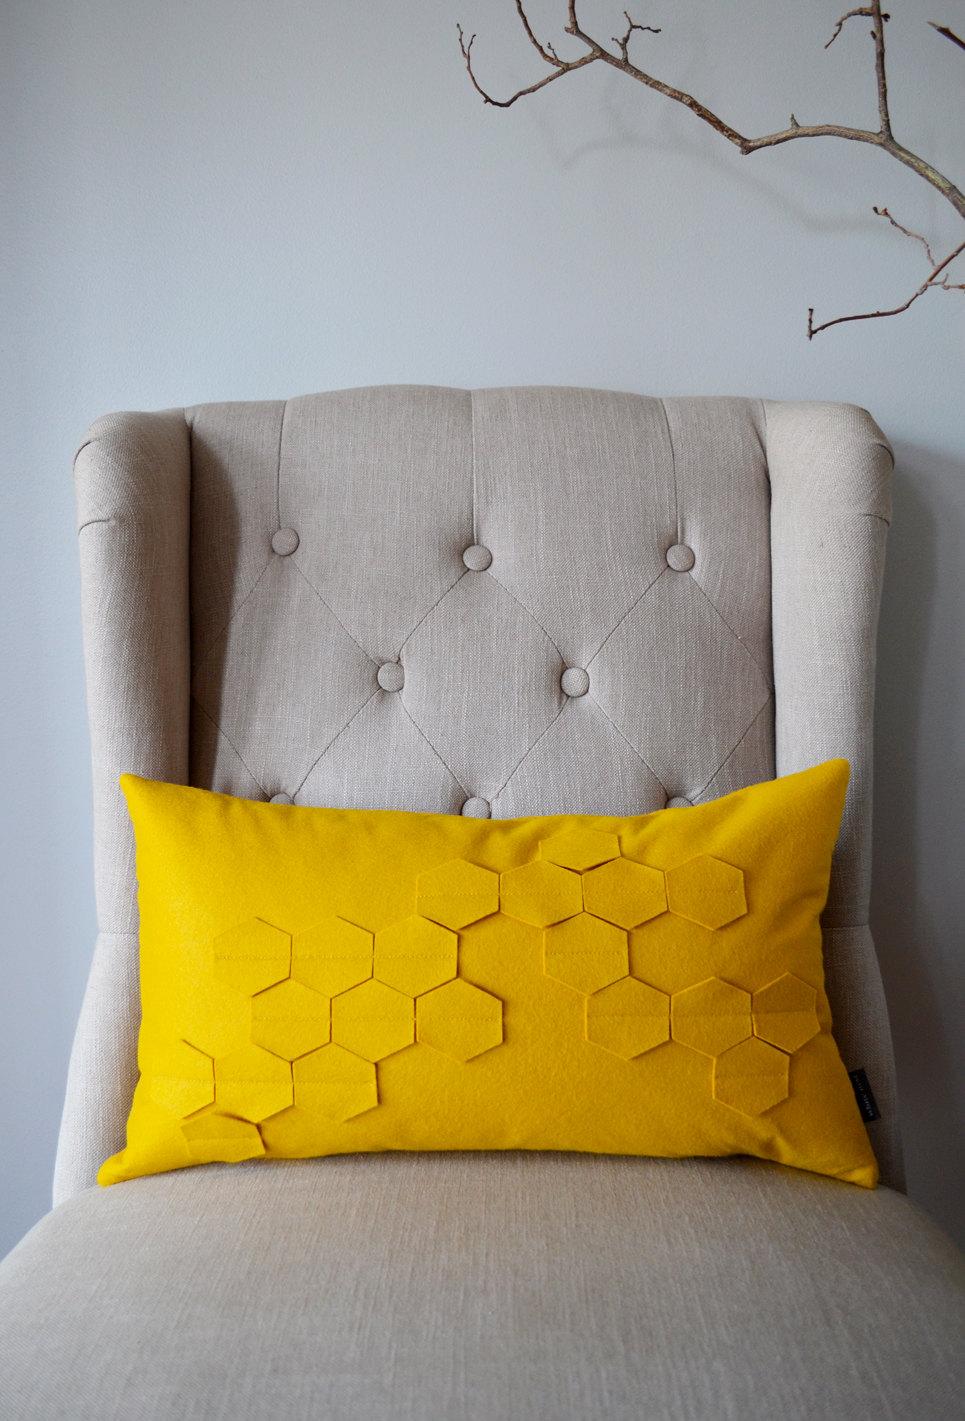 honeycomb-golden-yellow-felt-design